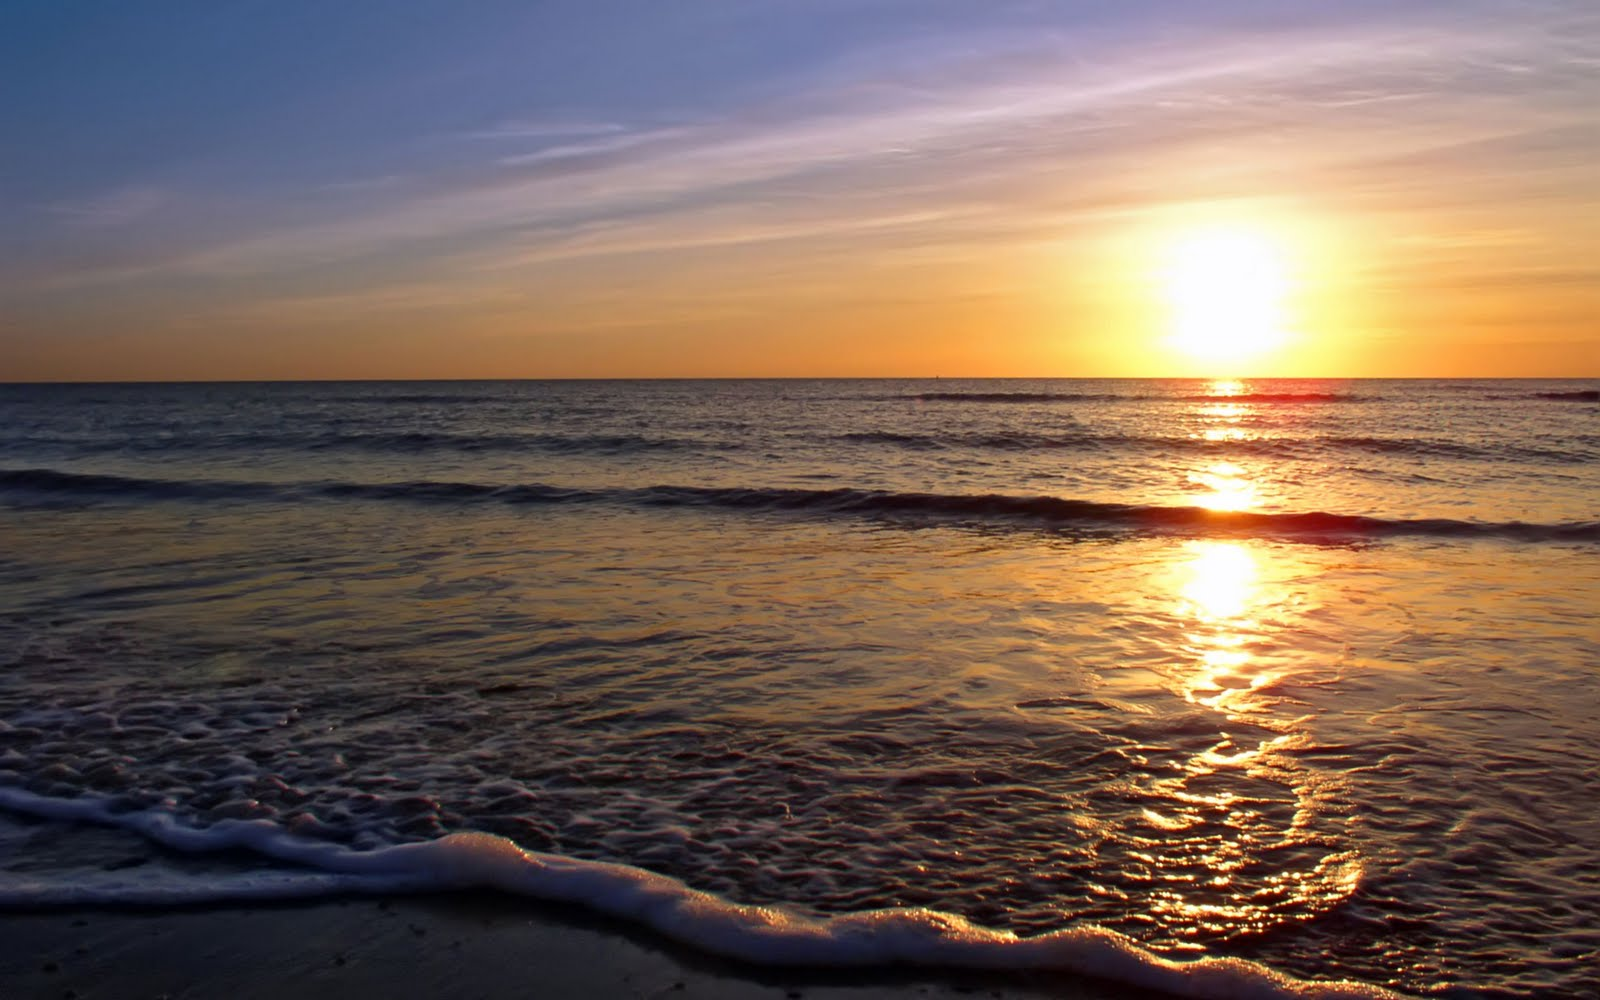 Sunset Beach Wallpapers, Sunrise Beach Wallpapers, Sunset, Sunrise ...